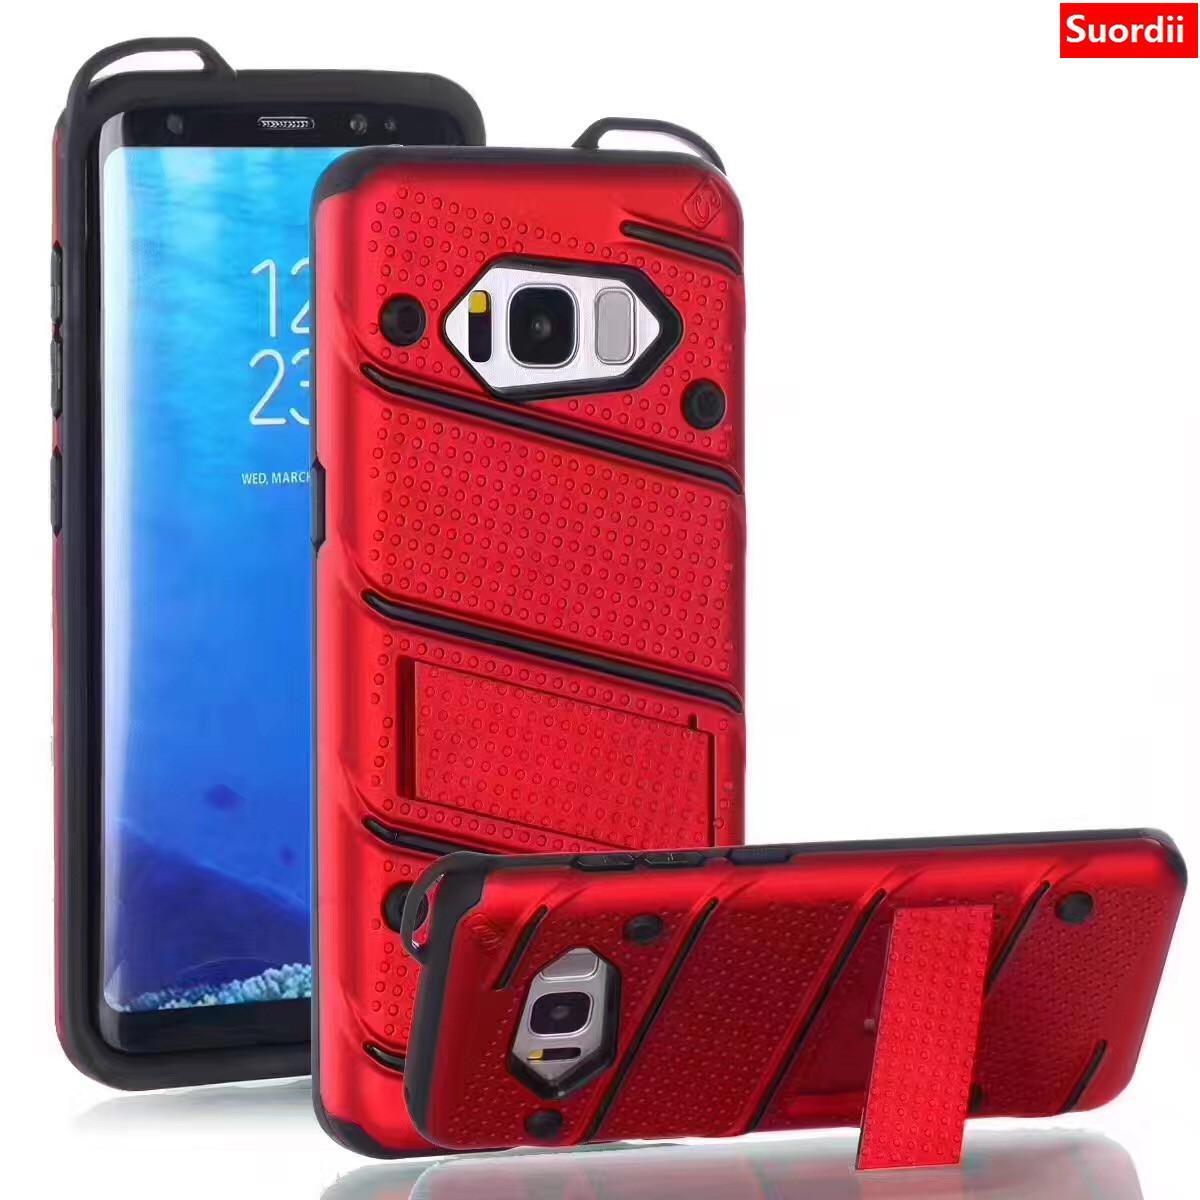 Kickstand caja del teléfono para Samsung Galaxy J2 j5 j7 prime grand prime prime g530 s7 edge TPU + PC estuche rígido Armadura híbrida Contraportada